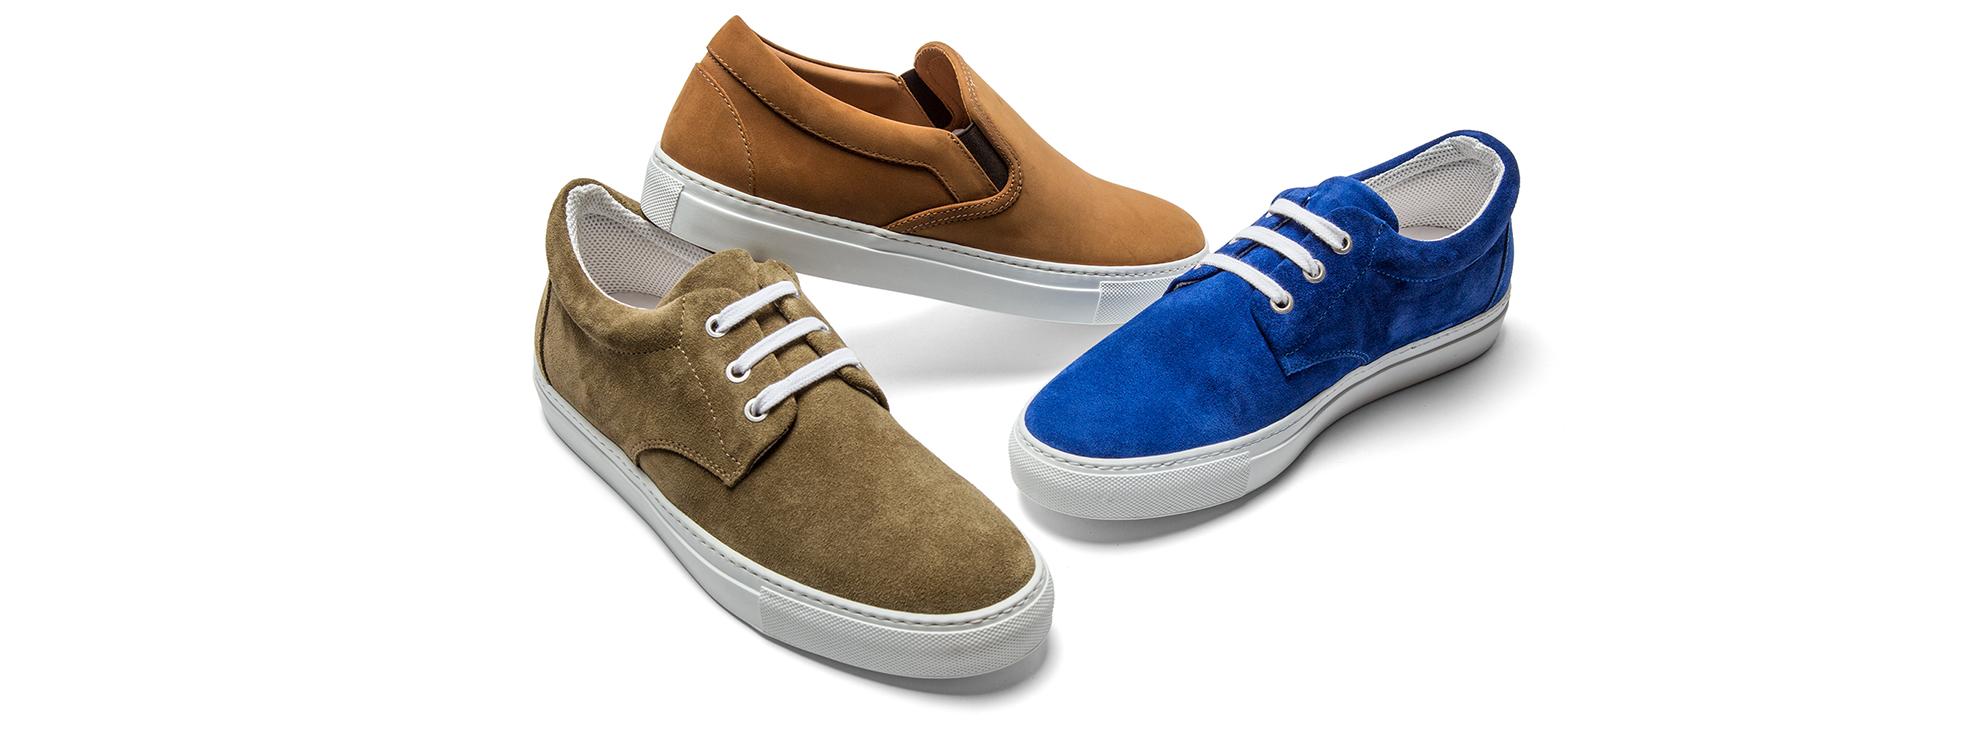 dhcreativeworks-paulstuart-shoes-editorial.jpg